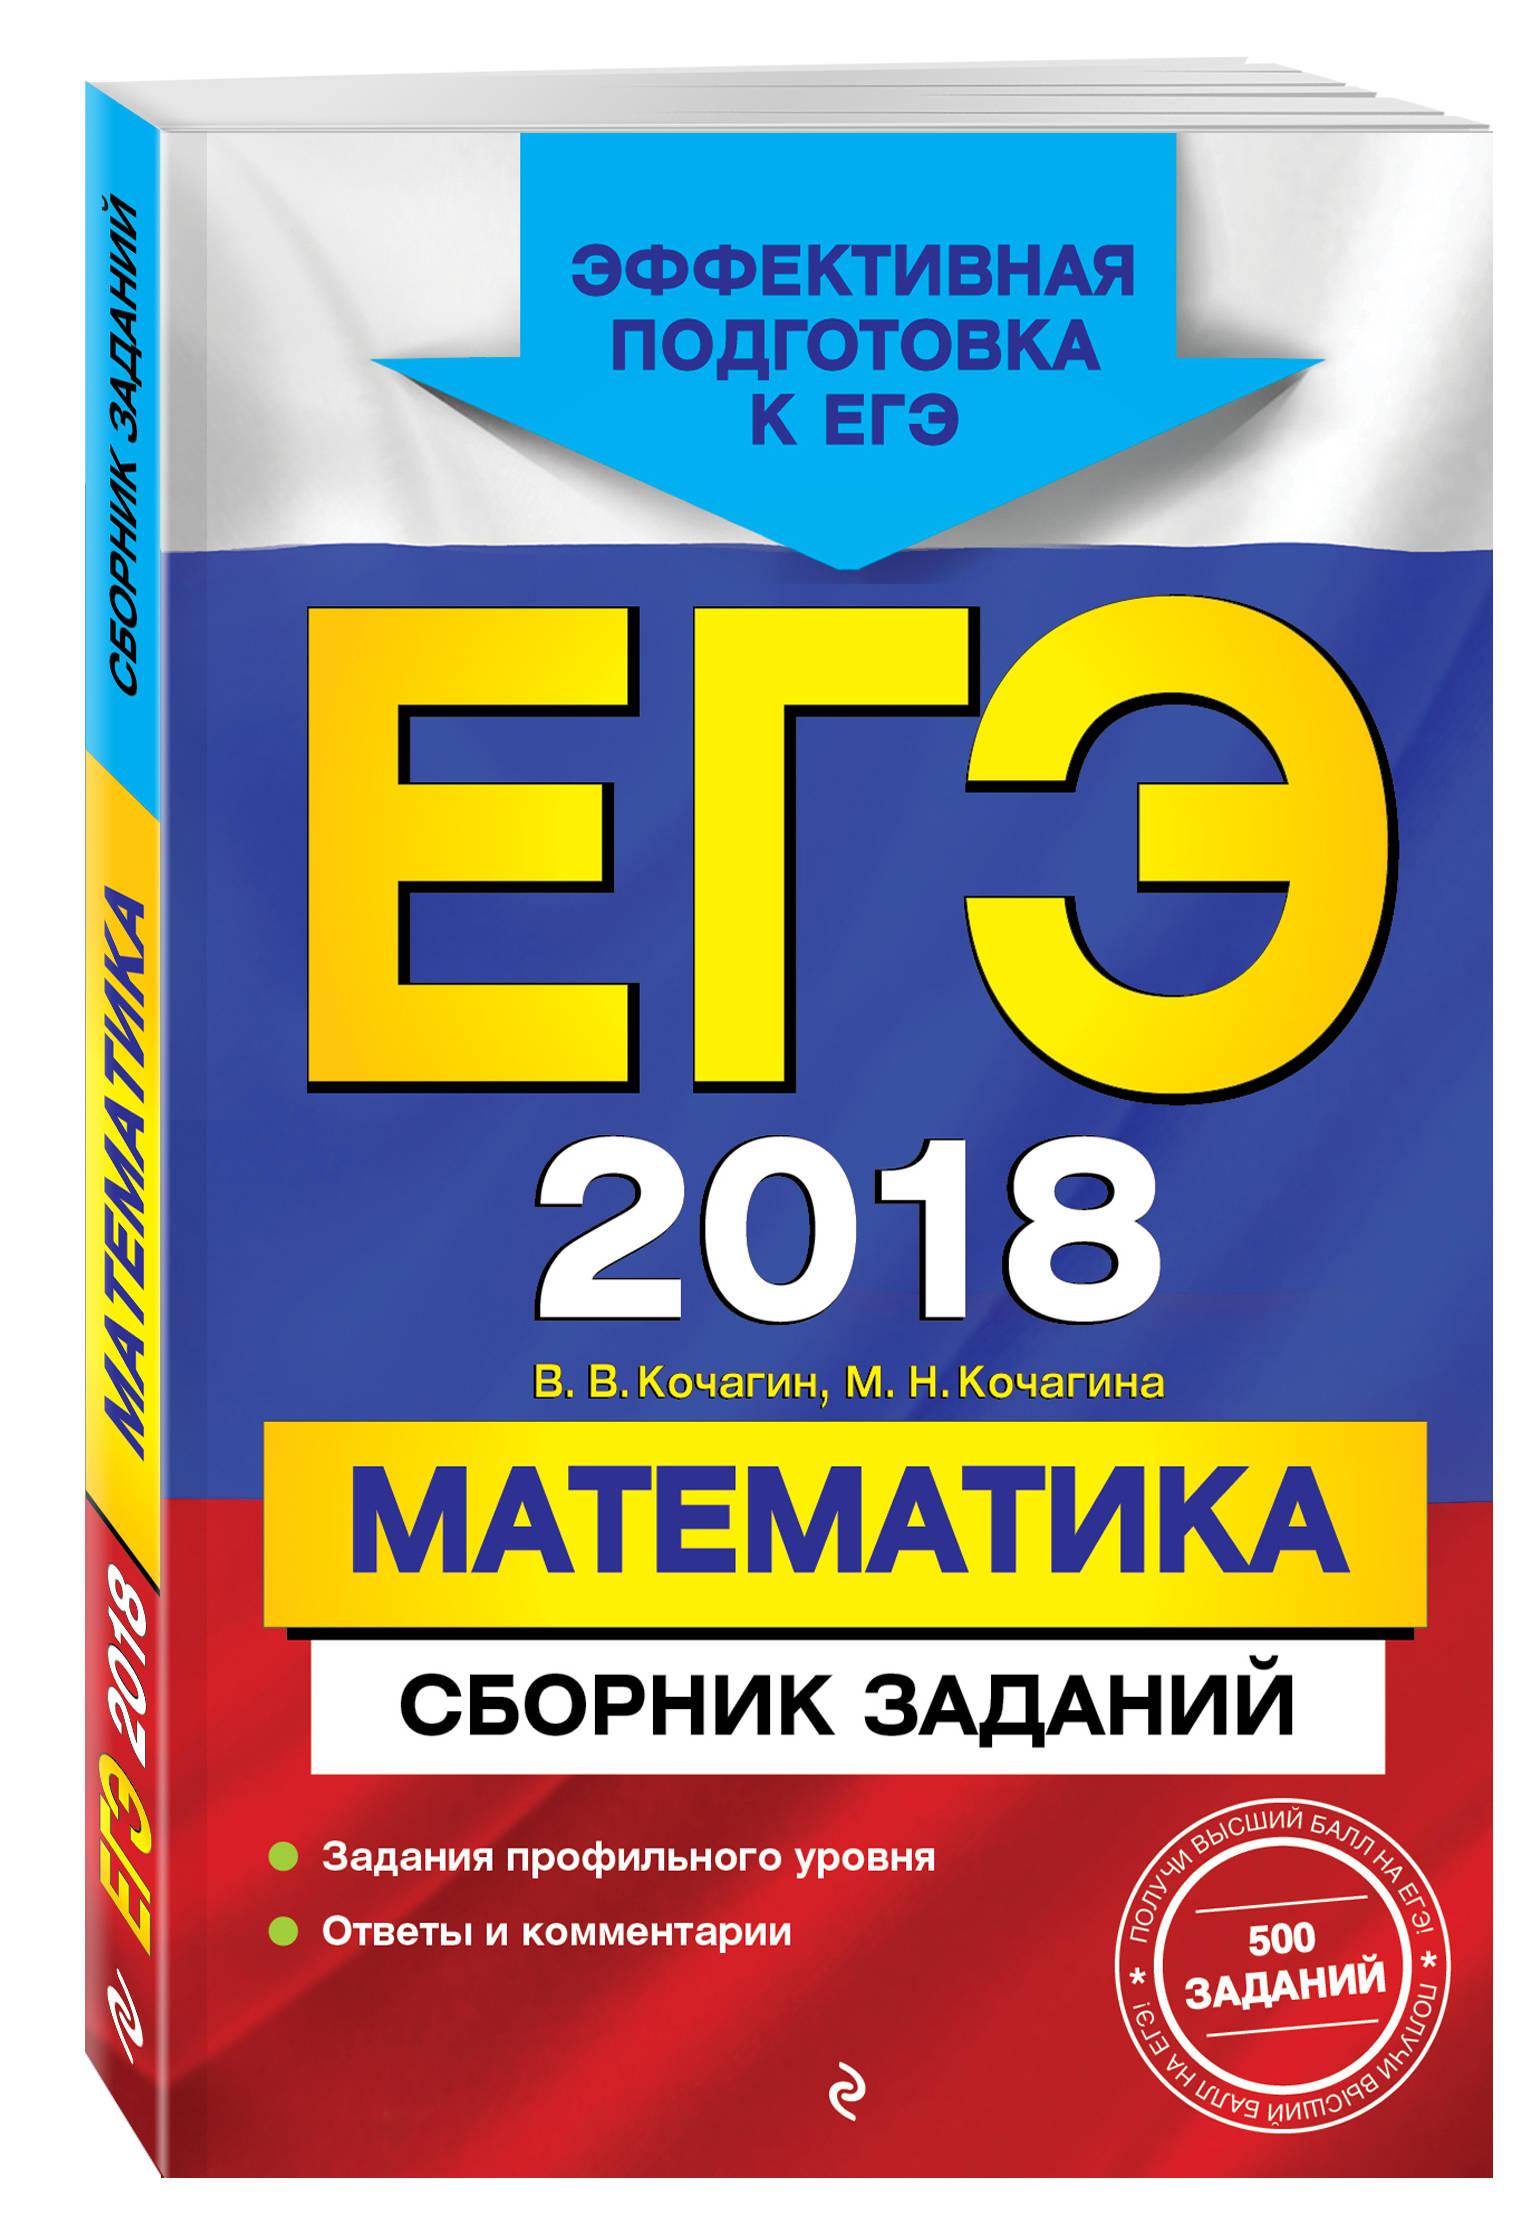 ЕГЭ-2018. Математика. Сборник заданий ( Кочагин В.В., Кочагина М.Н.  )